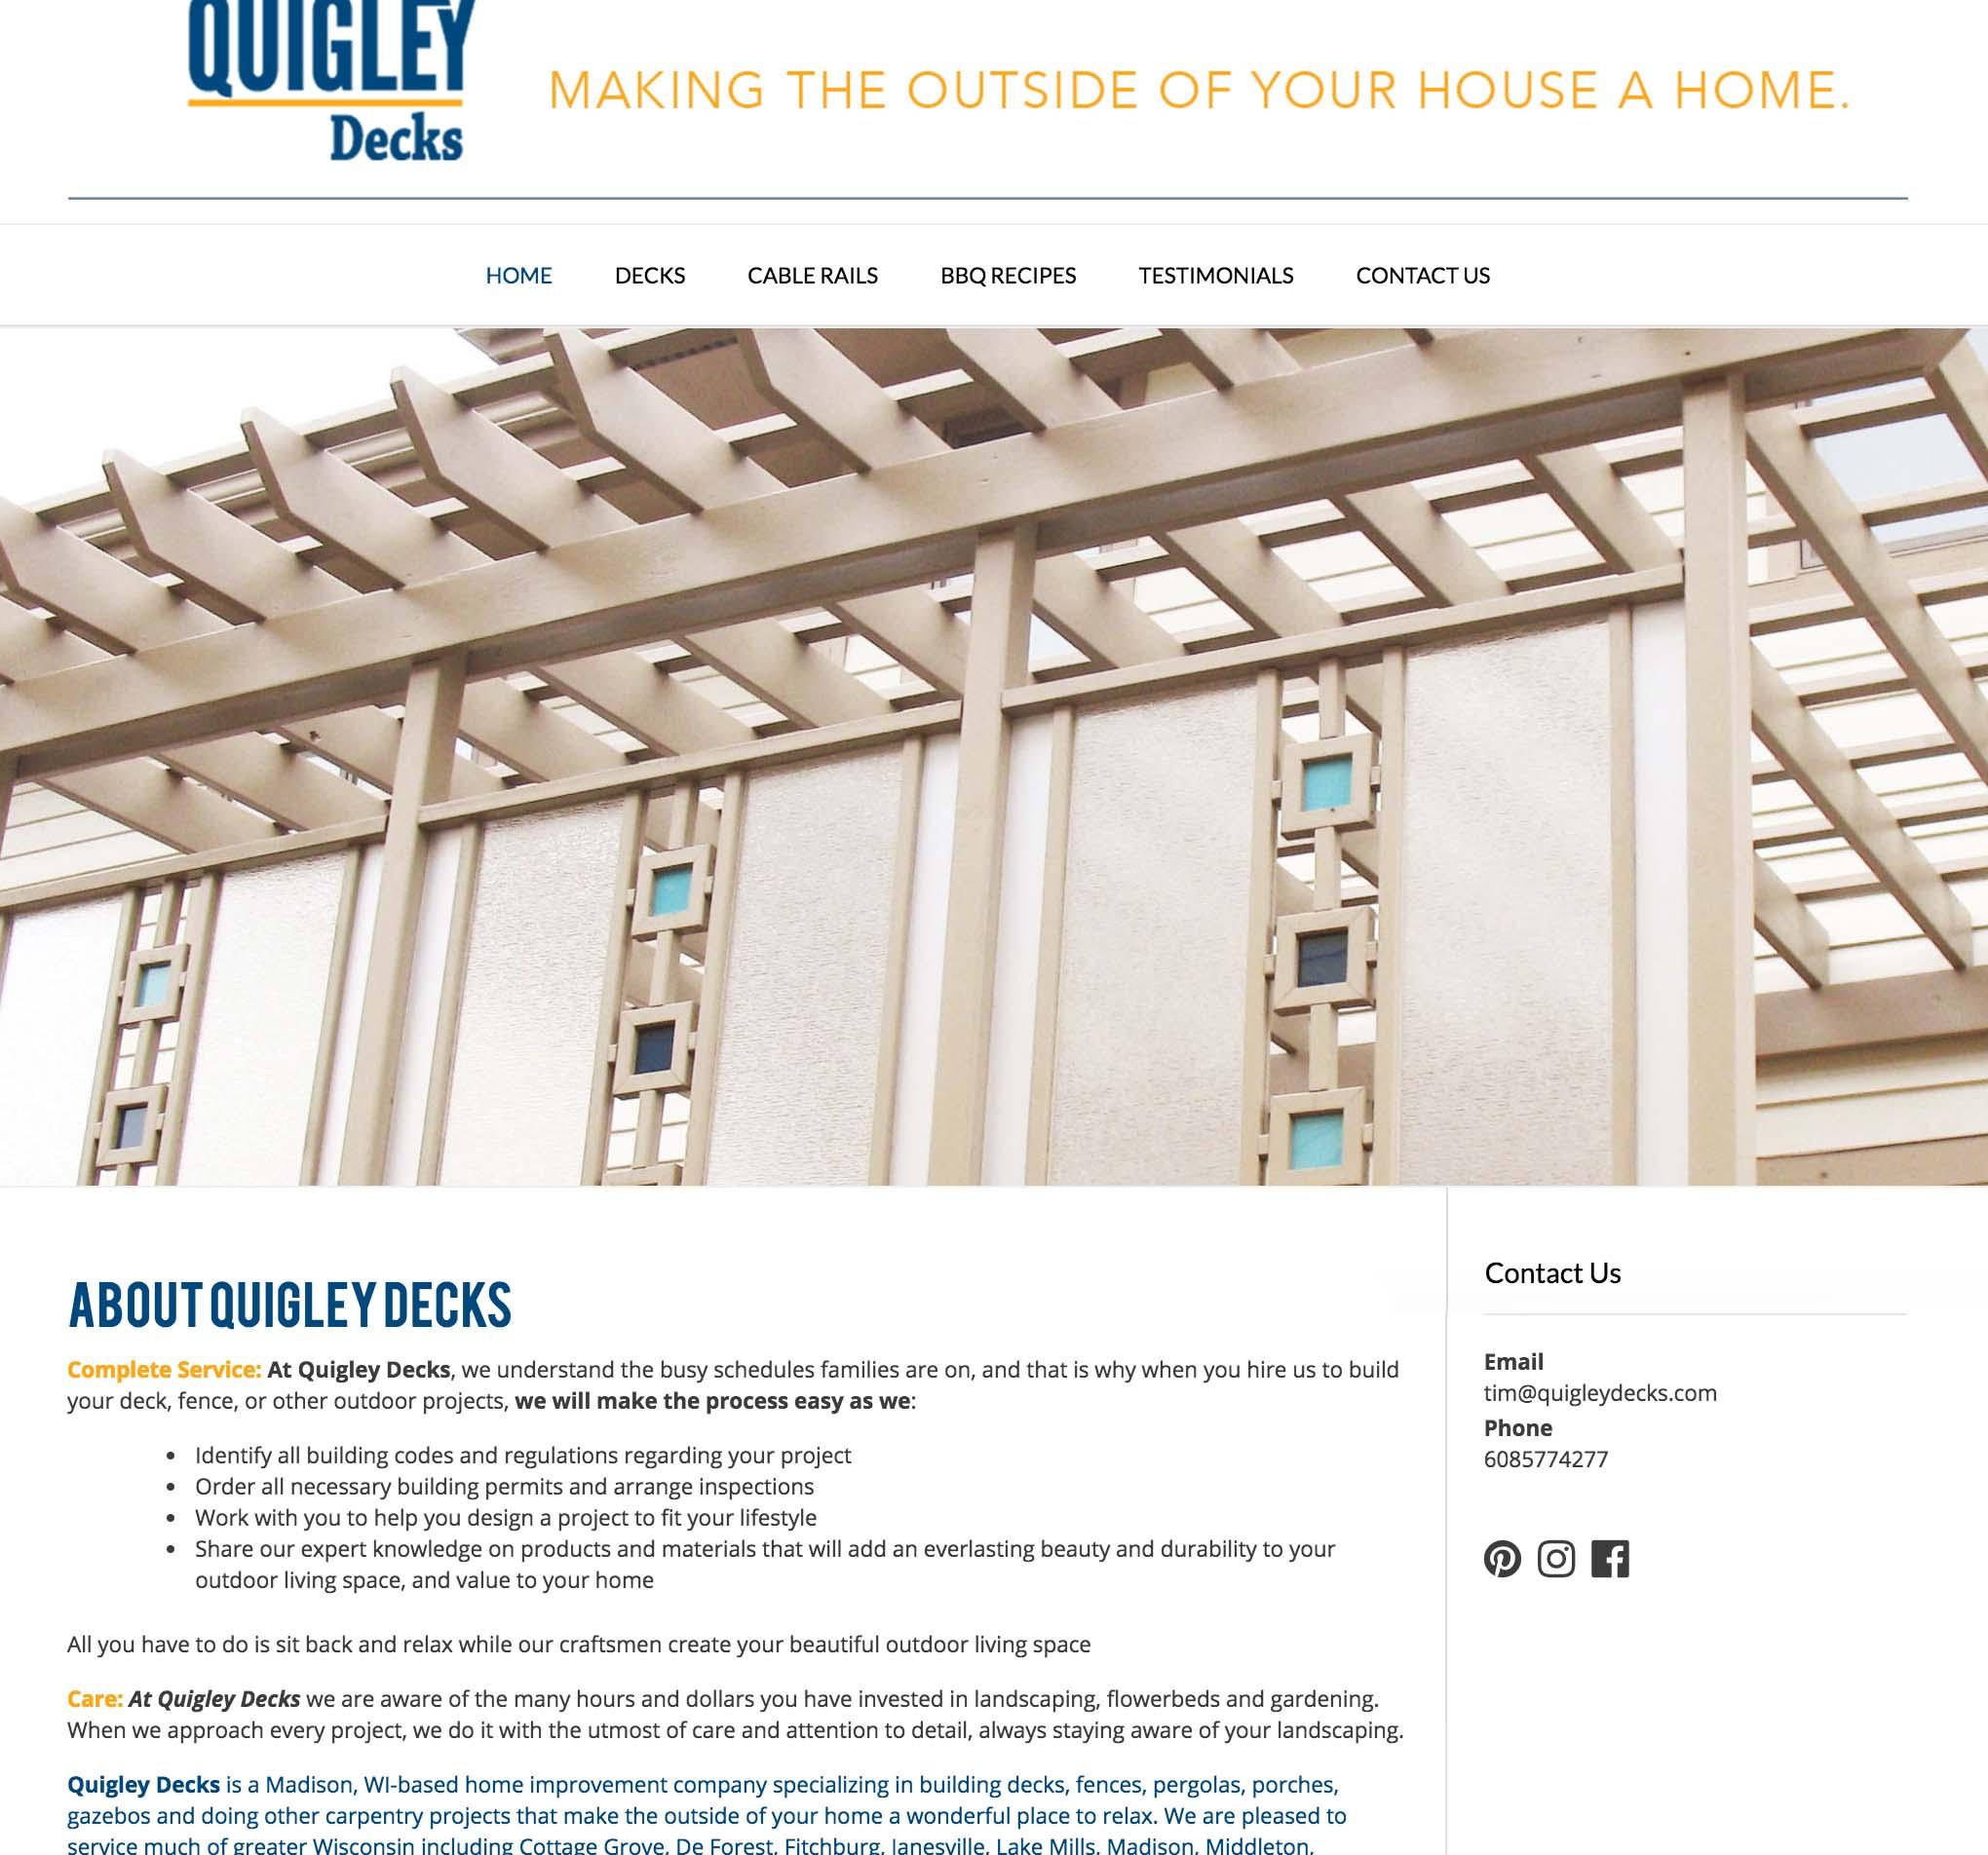 QuigleyDecks.com